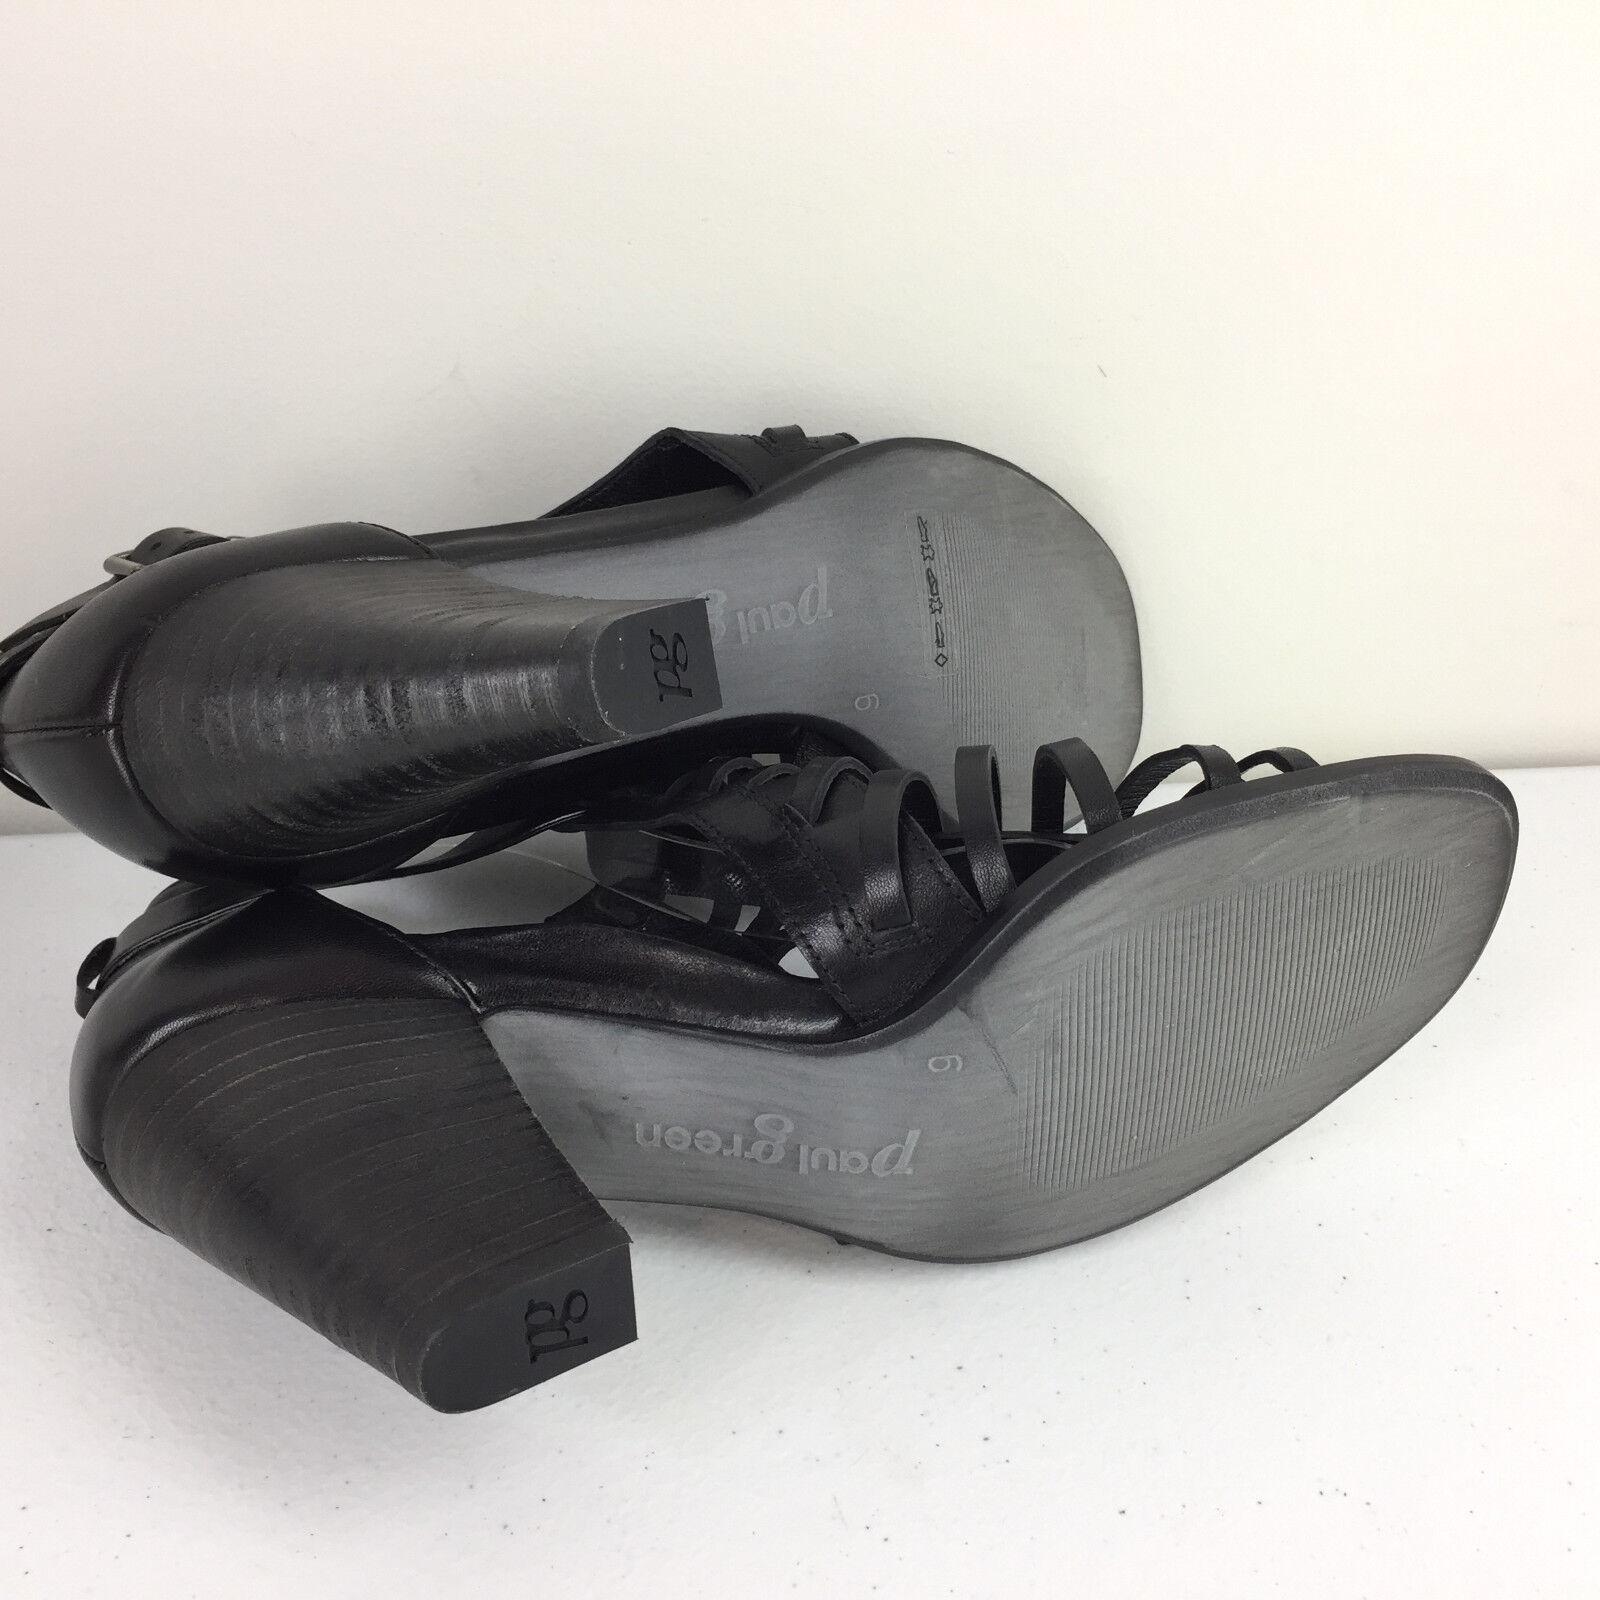 395 New Paul Green Black High Heel Sandals UK UK UK 6 US 8.5 fisherman 621736